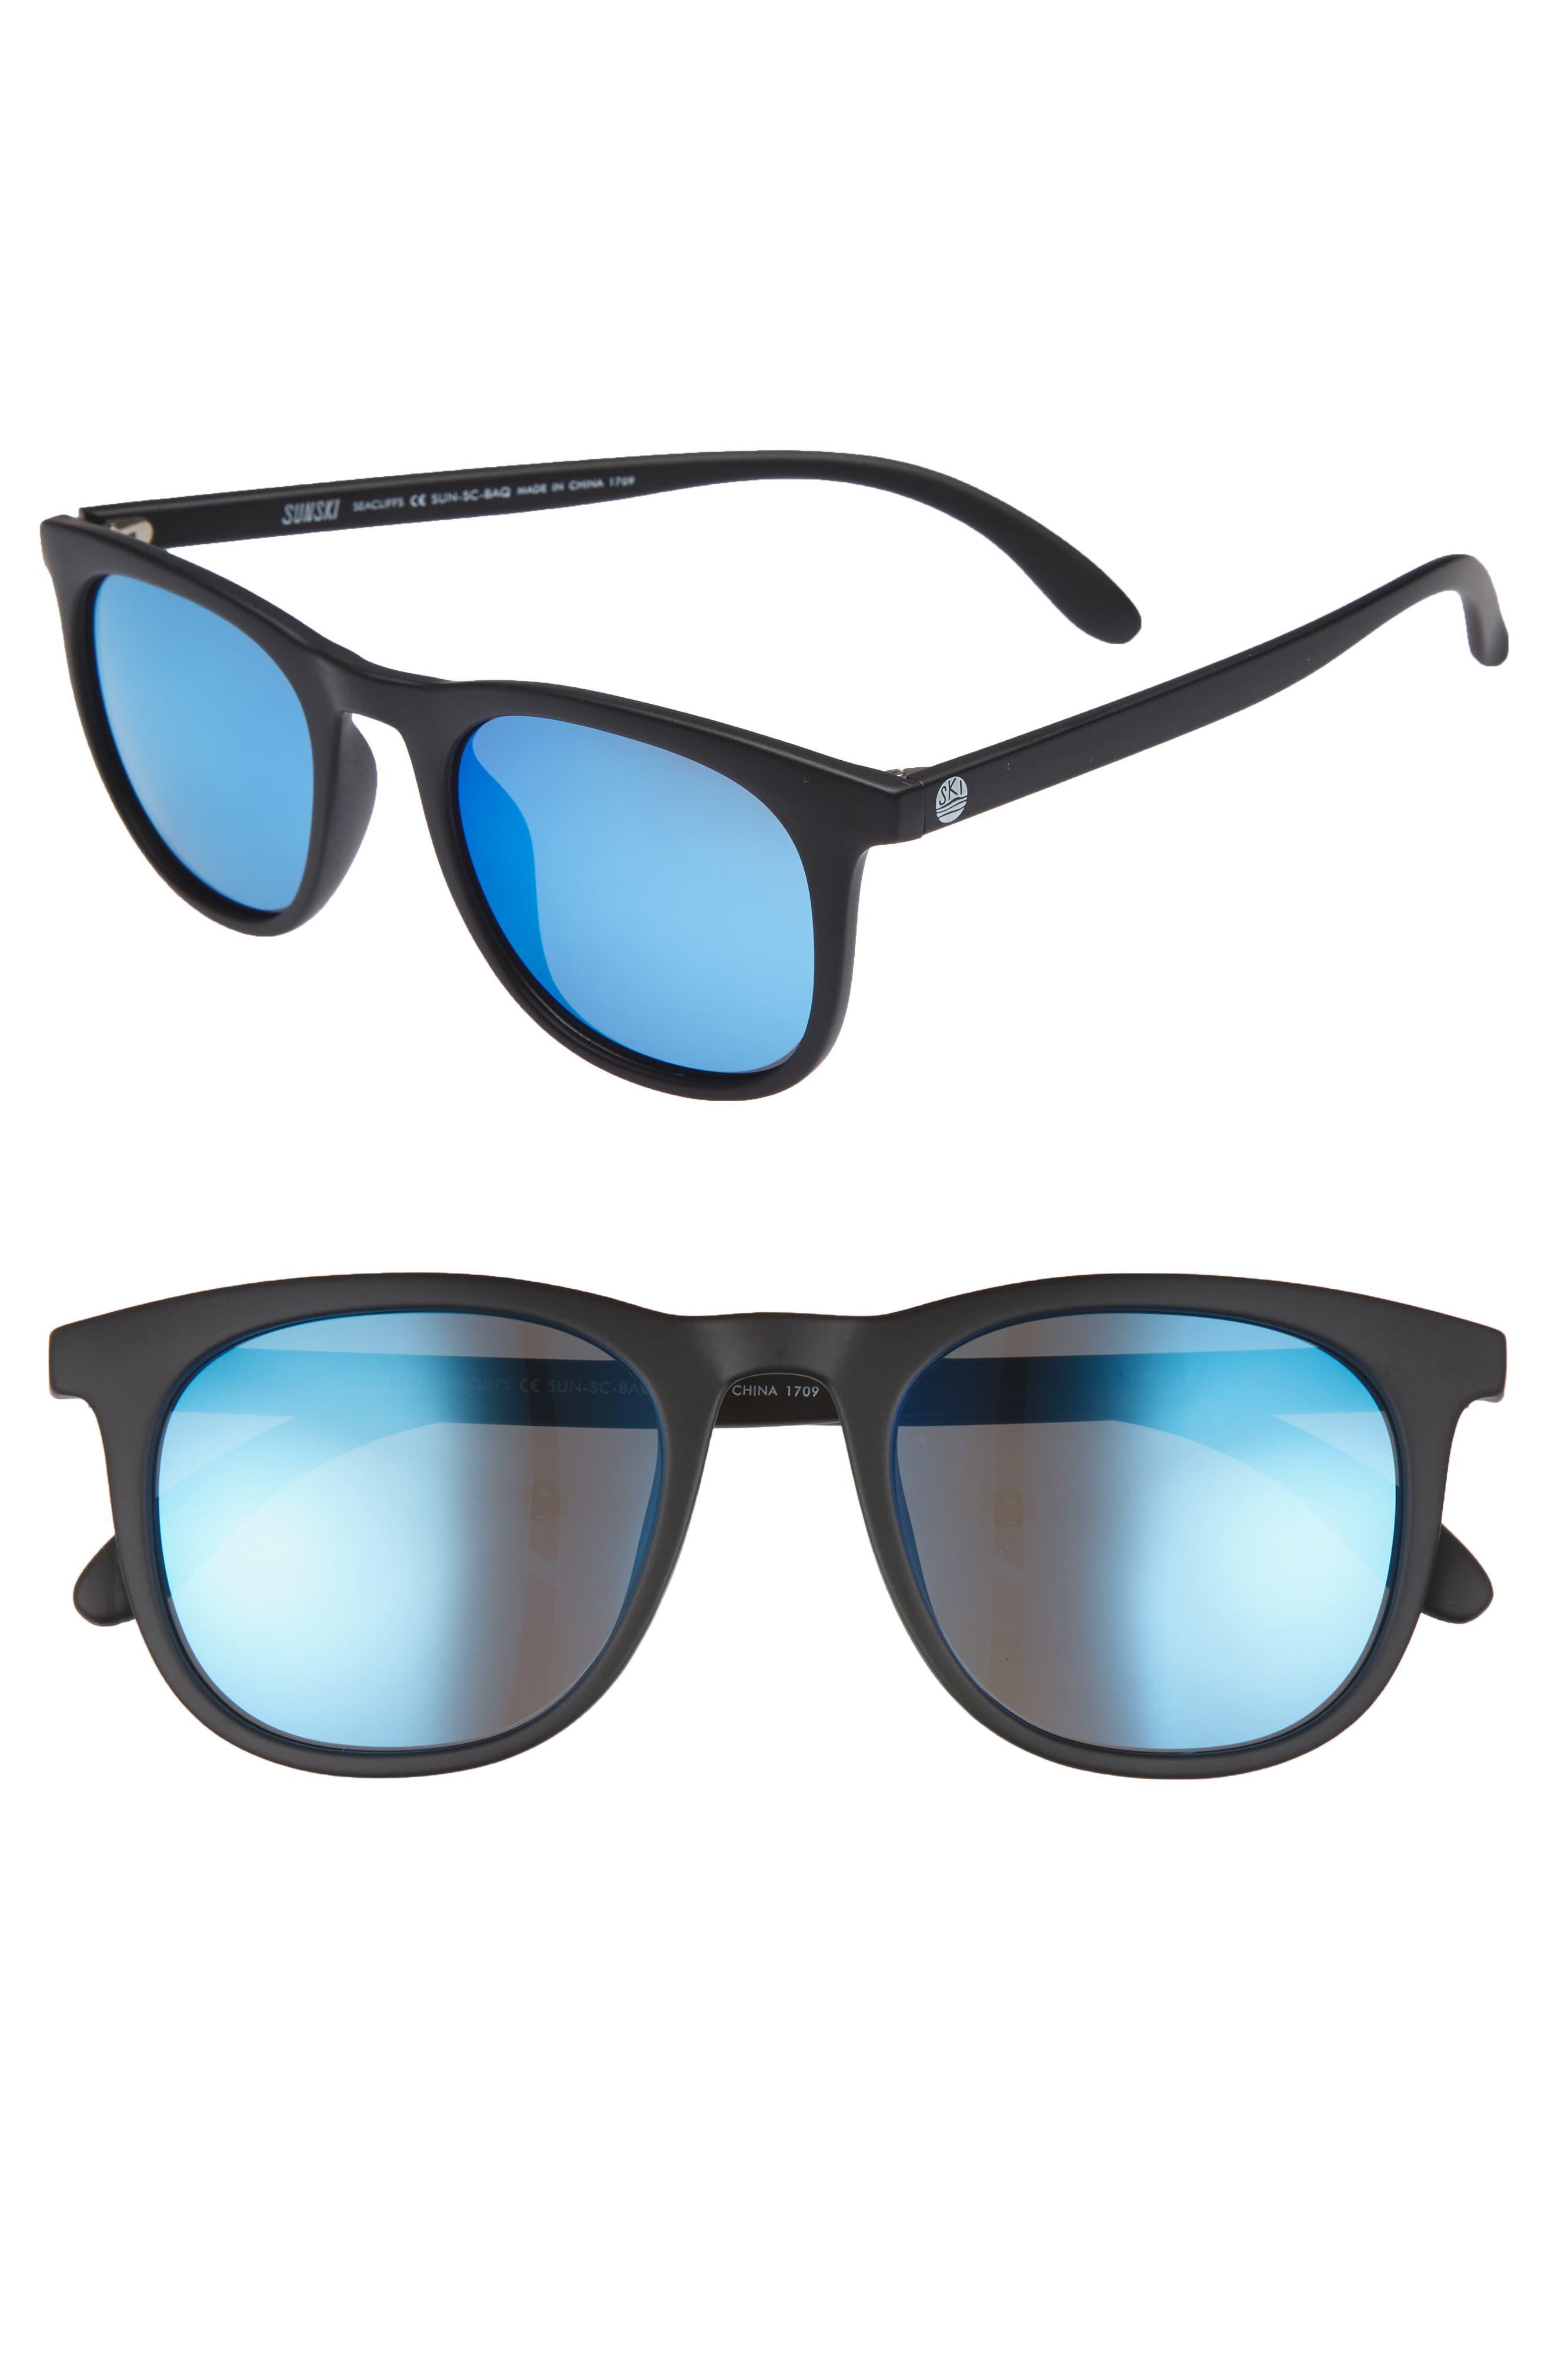 Alternate Image 1 Selected - Sunski Seacliff 48mm Polarized Sunglasses